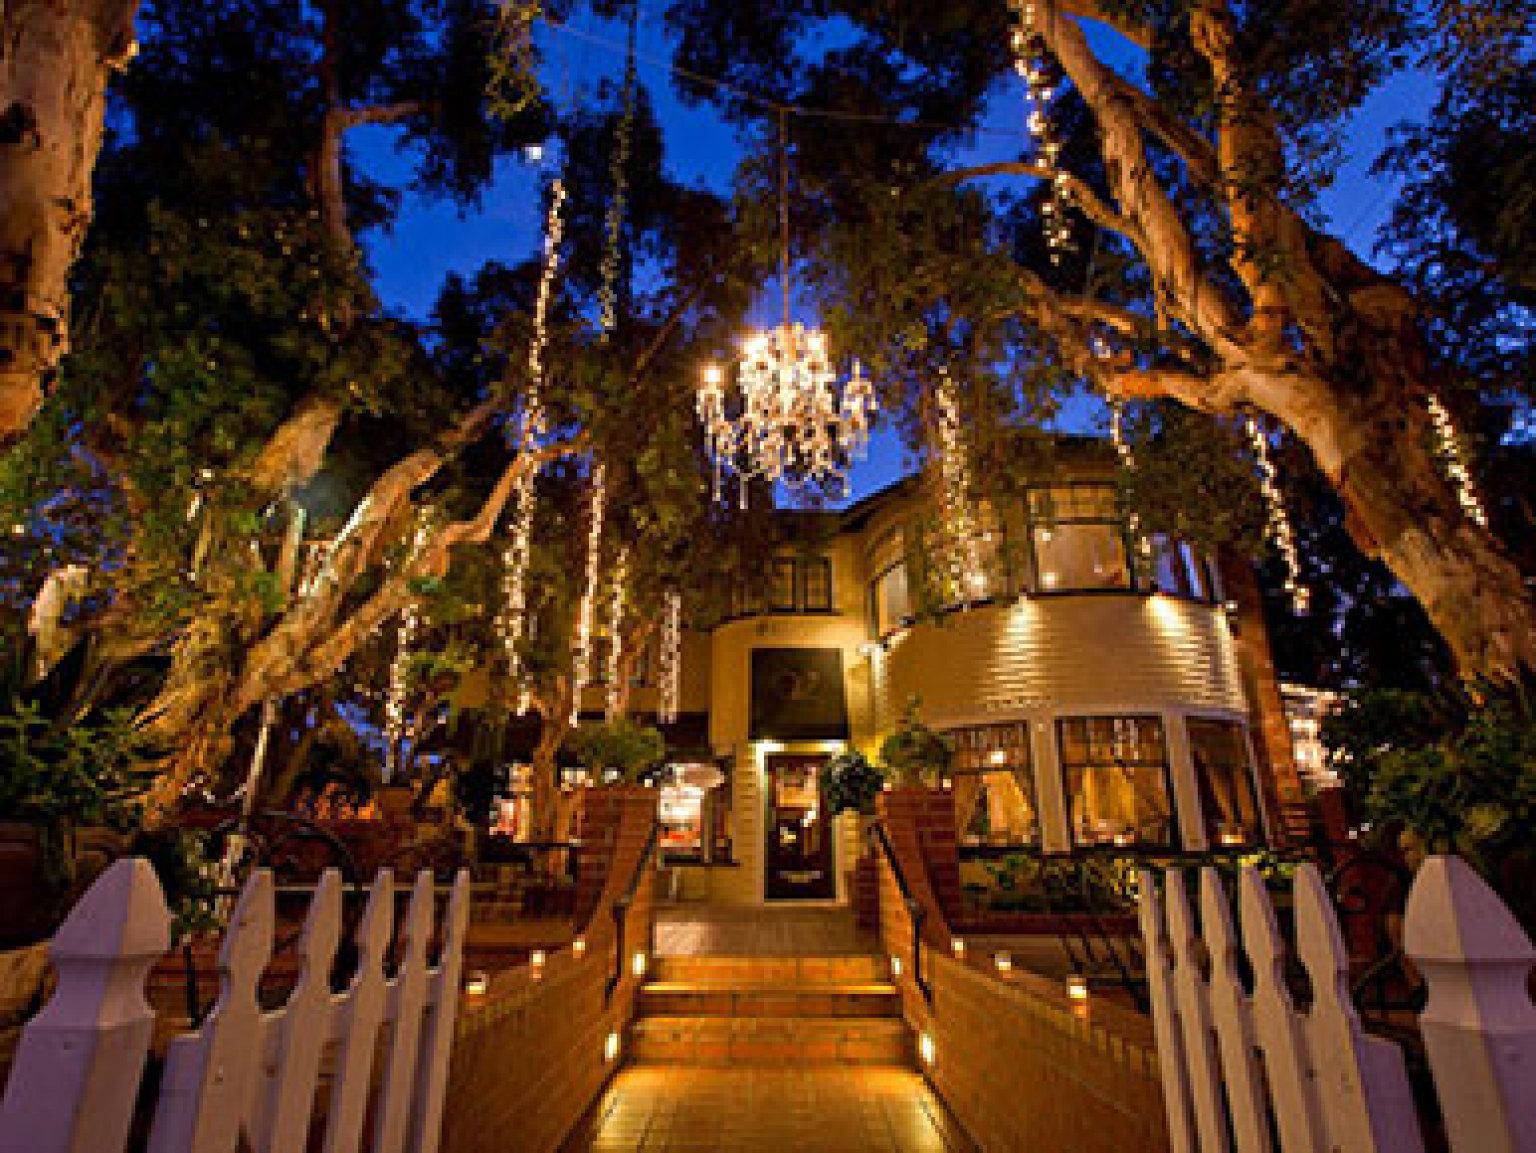 LA Wedding Venues Best Restaurants Museums Amp Gardens PHOTOS